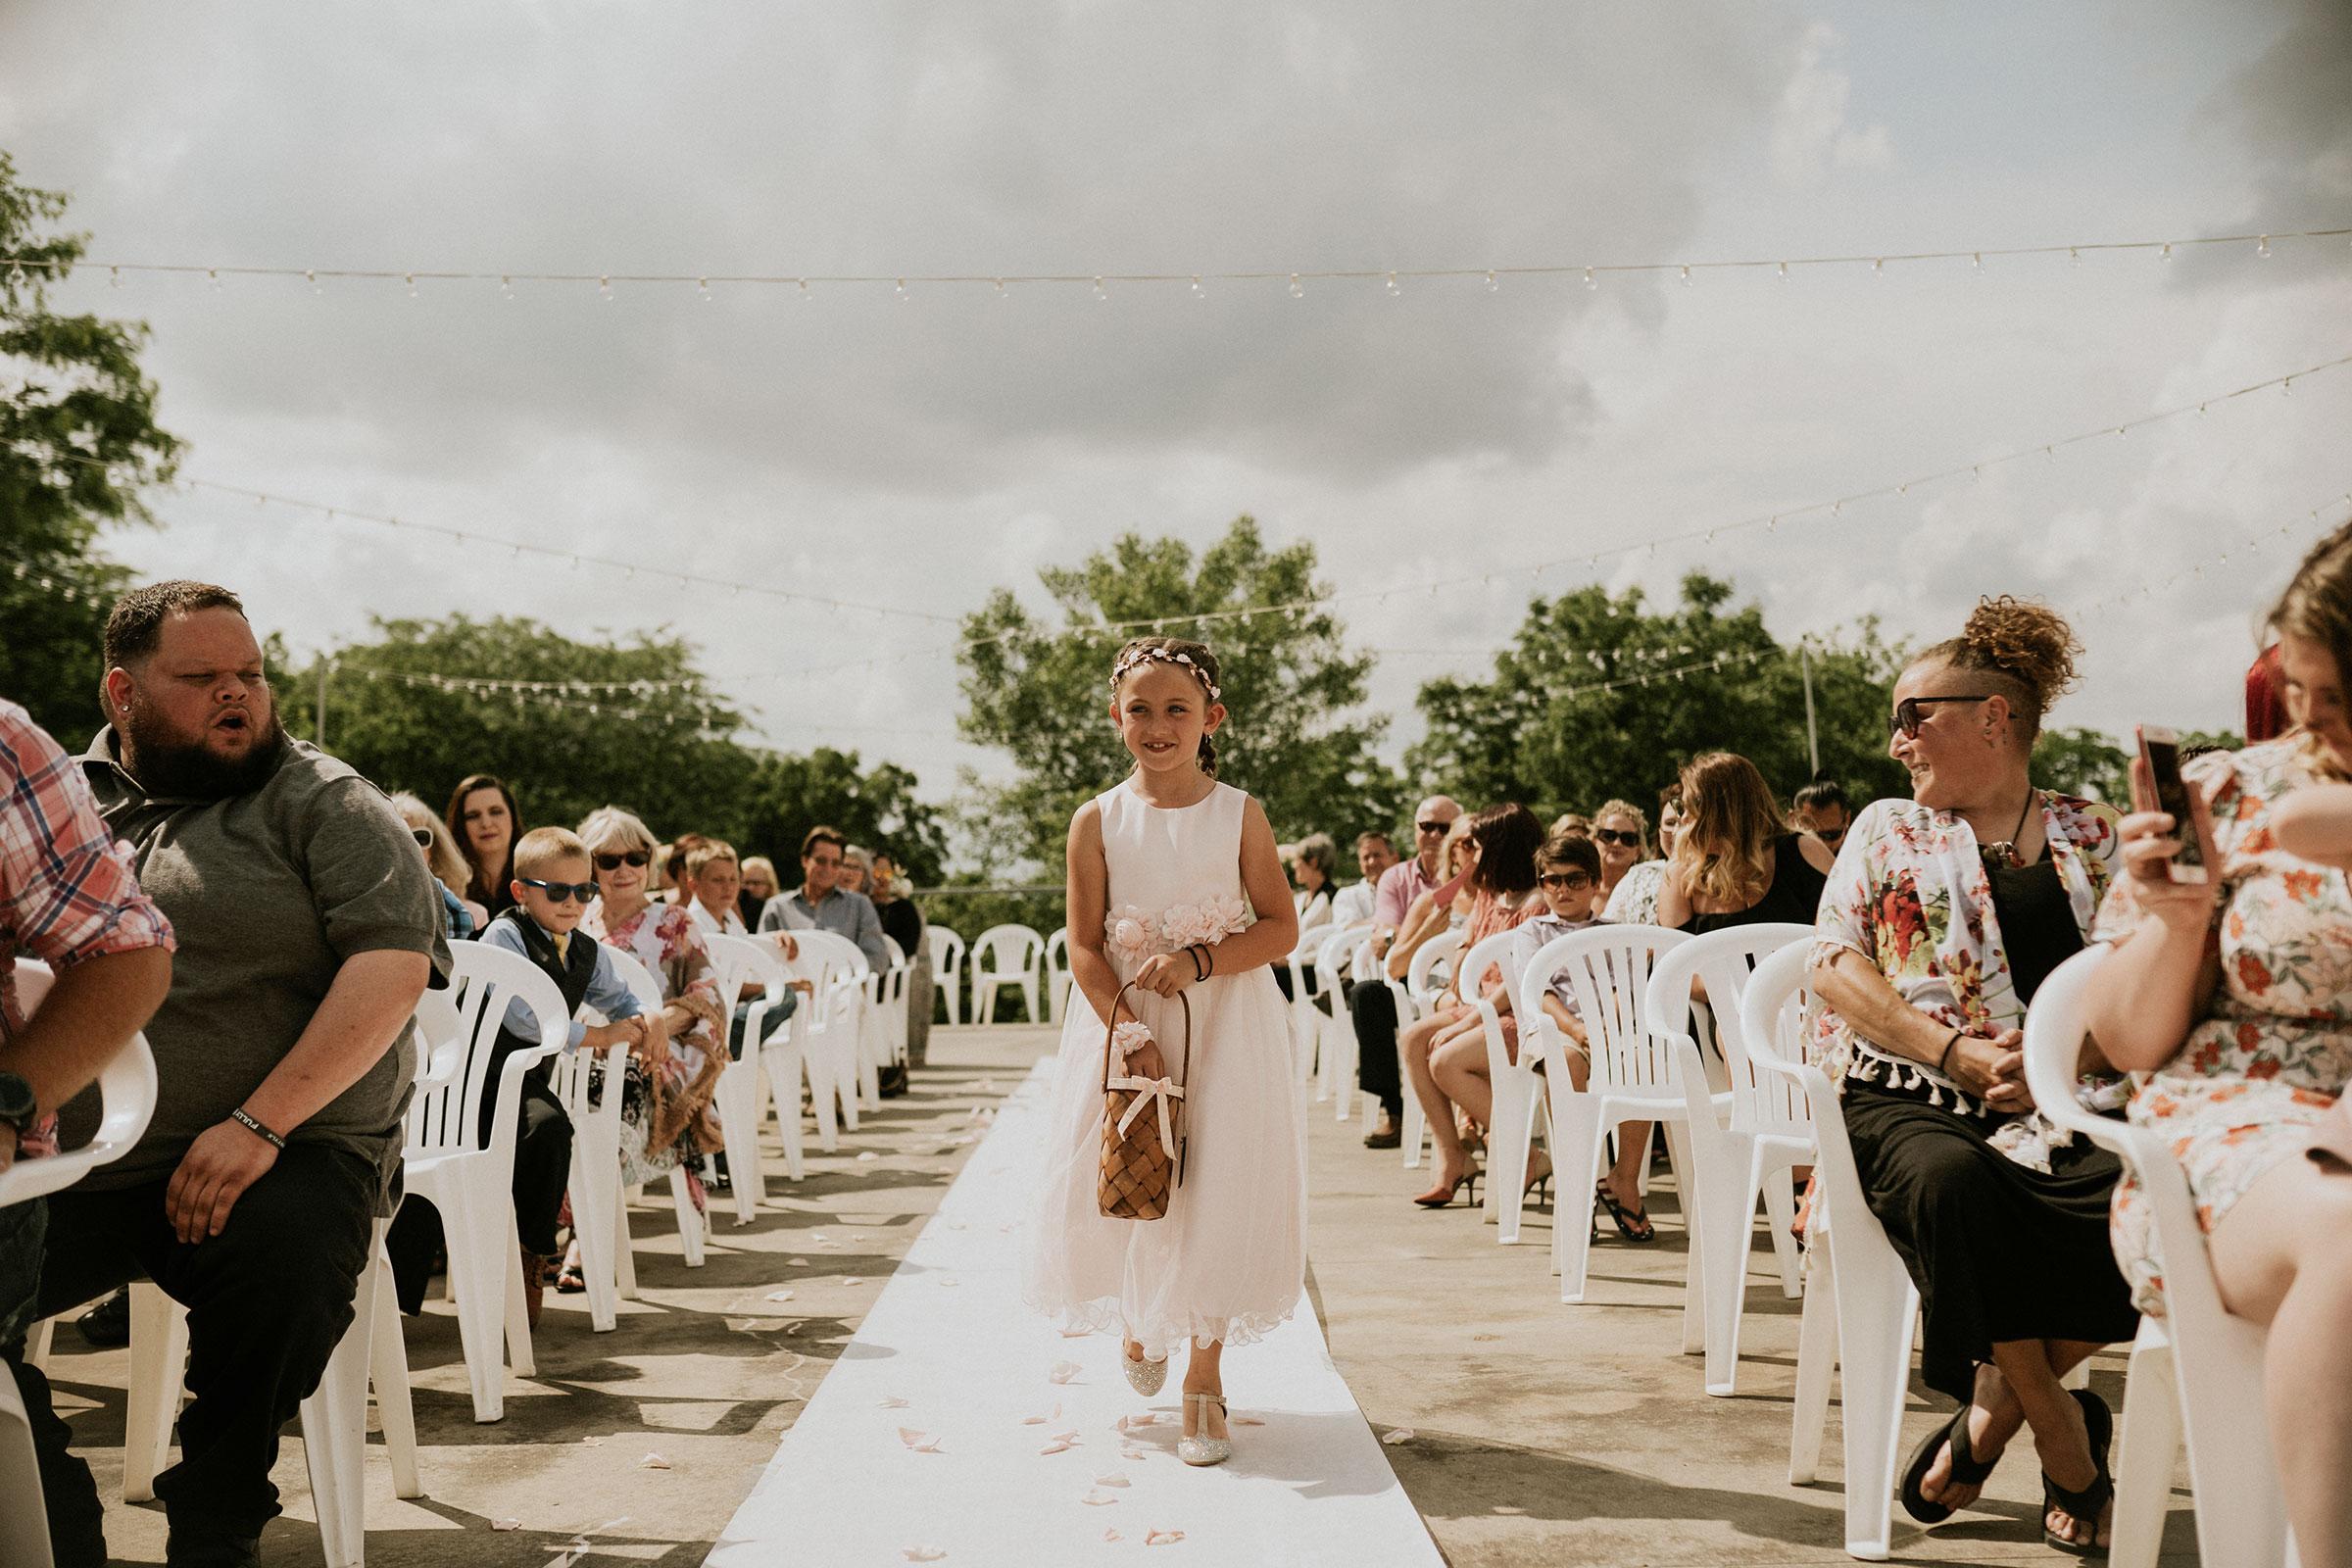 flower-girl-walking-down-aisle-wedding-summerset-winery-indianola-iowa-raelyn-ramey-photography.jpg